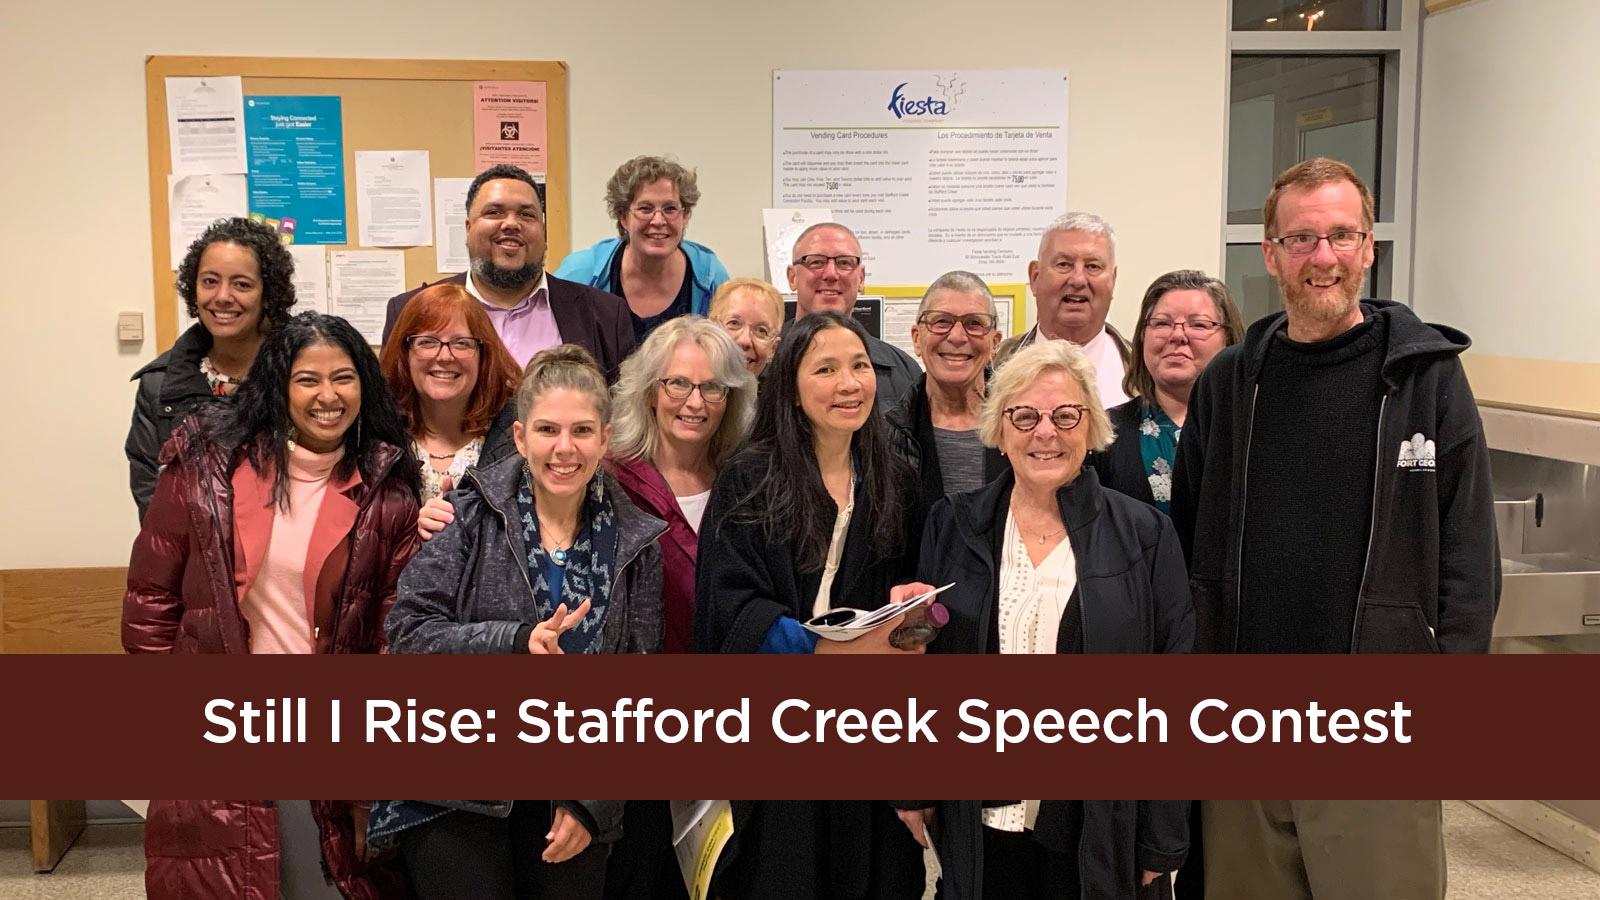 Still I Rise | Stafford Creek Speech Contest